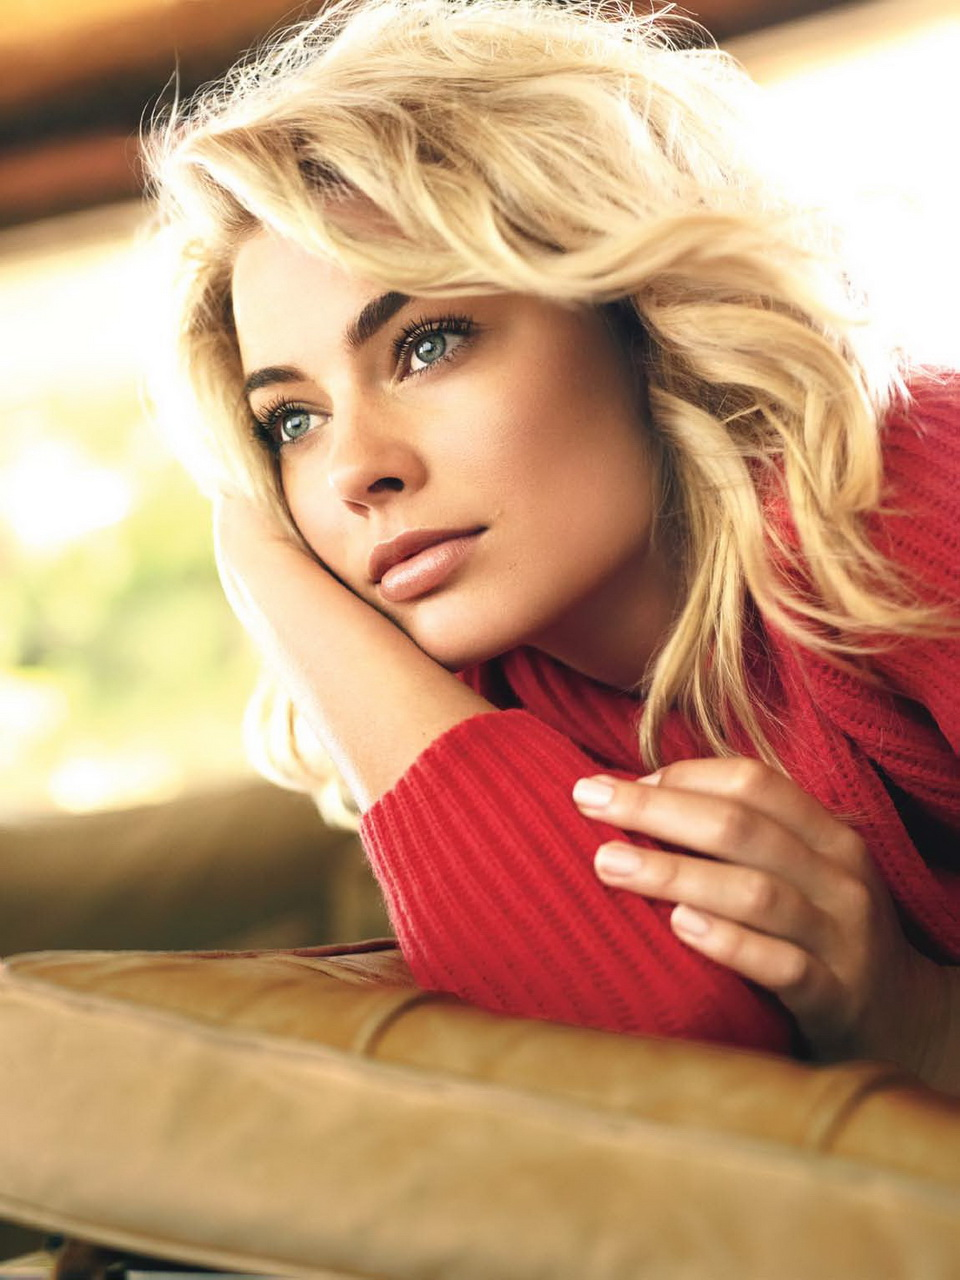 Watching Marilyn Monroe movie breaks my heart because they're misogynistic: Margot Robbie